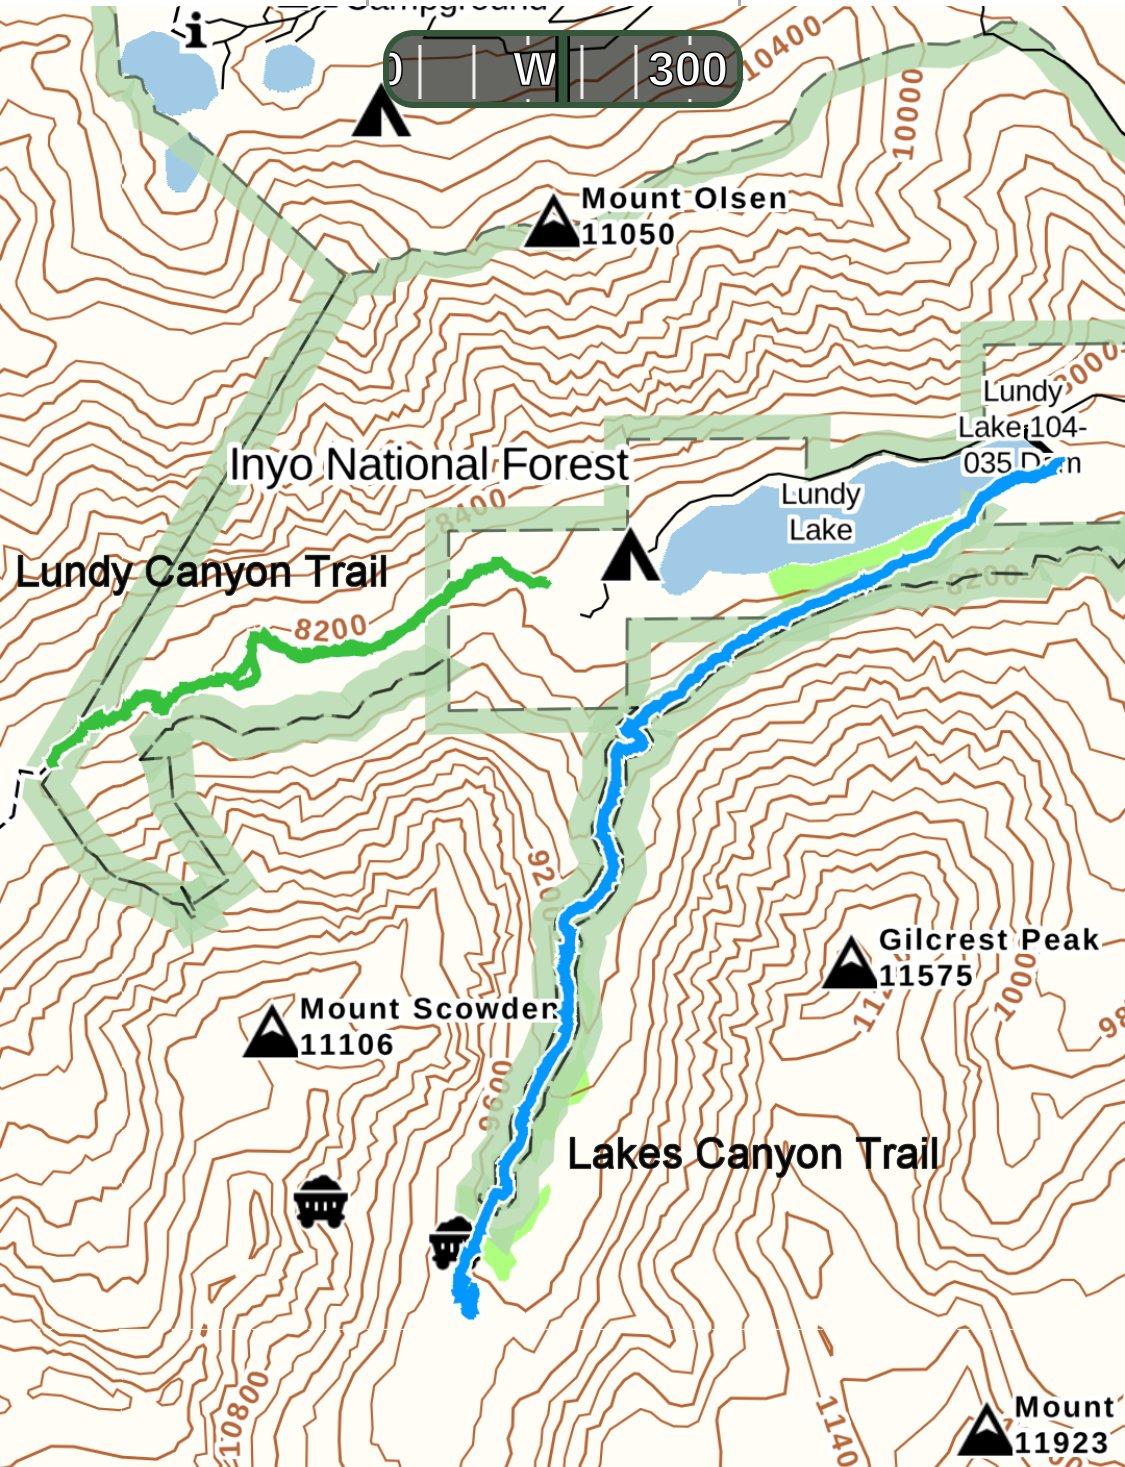 lundy_canyon_trails.jpg